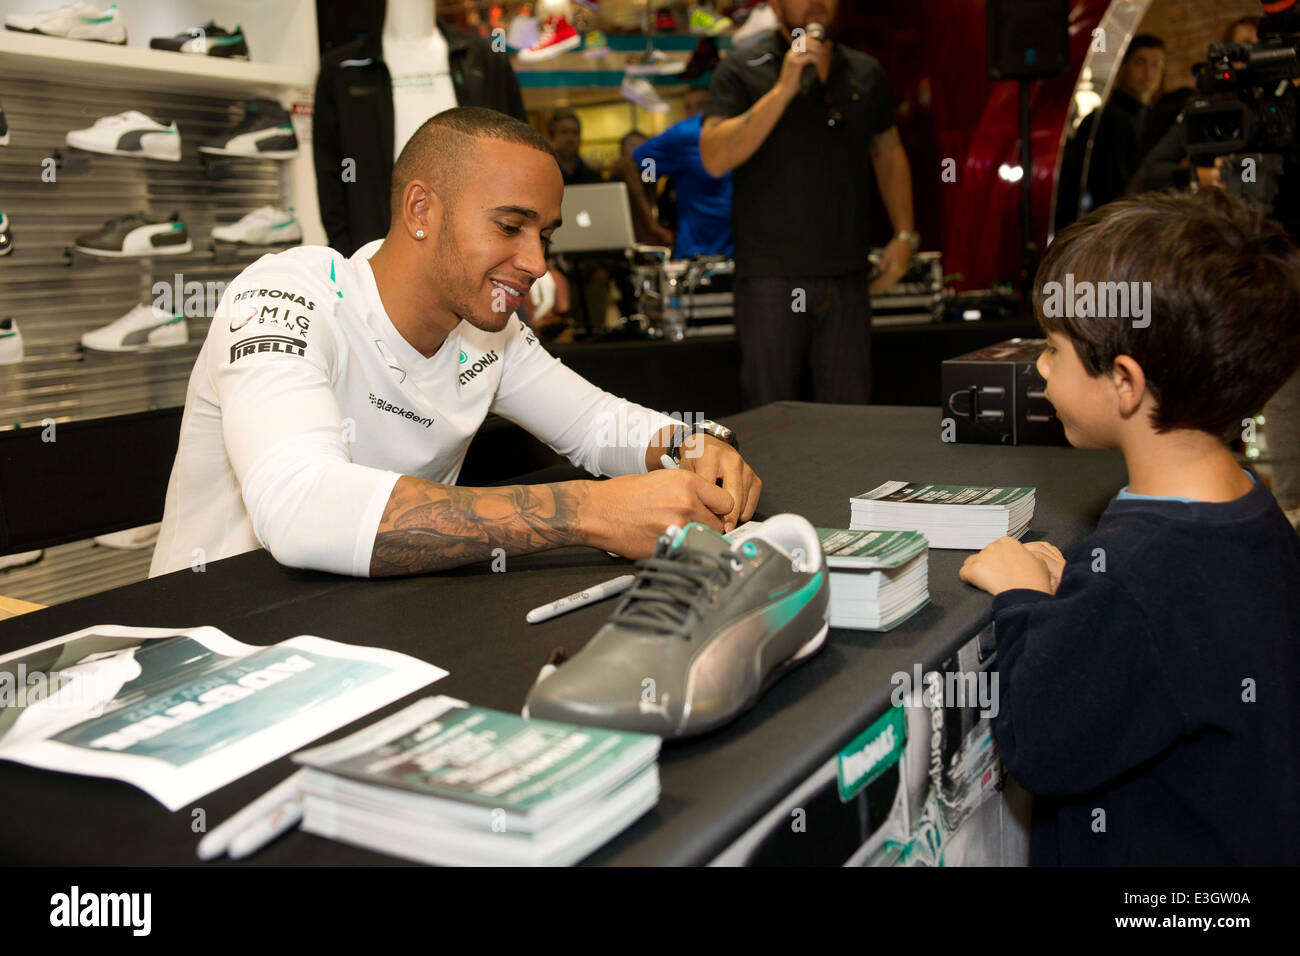 Lewis Hamilton signs autographs for Formula 1 fans at Shoe Palace at the Barton  Creek Square Mall Featuring  Lewis Hamilton Where  Austin e78a5209b